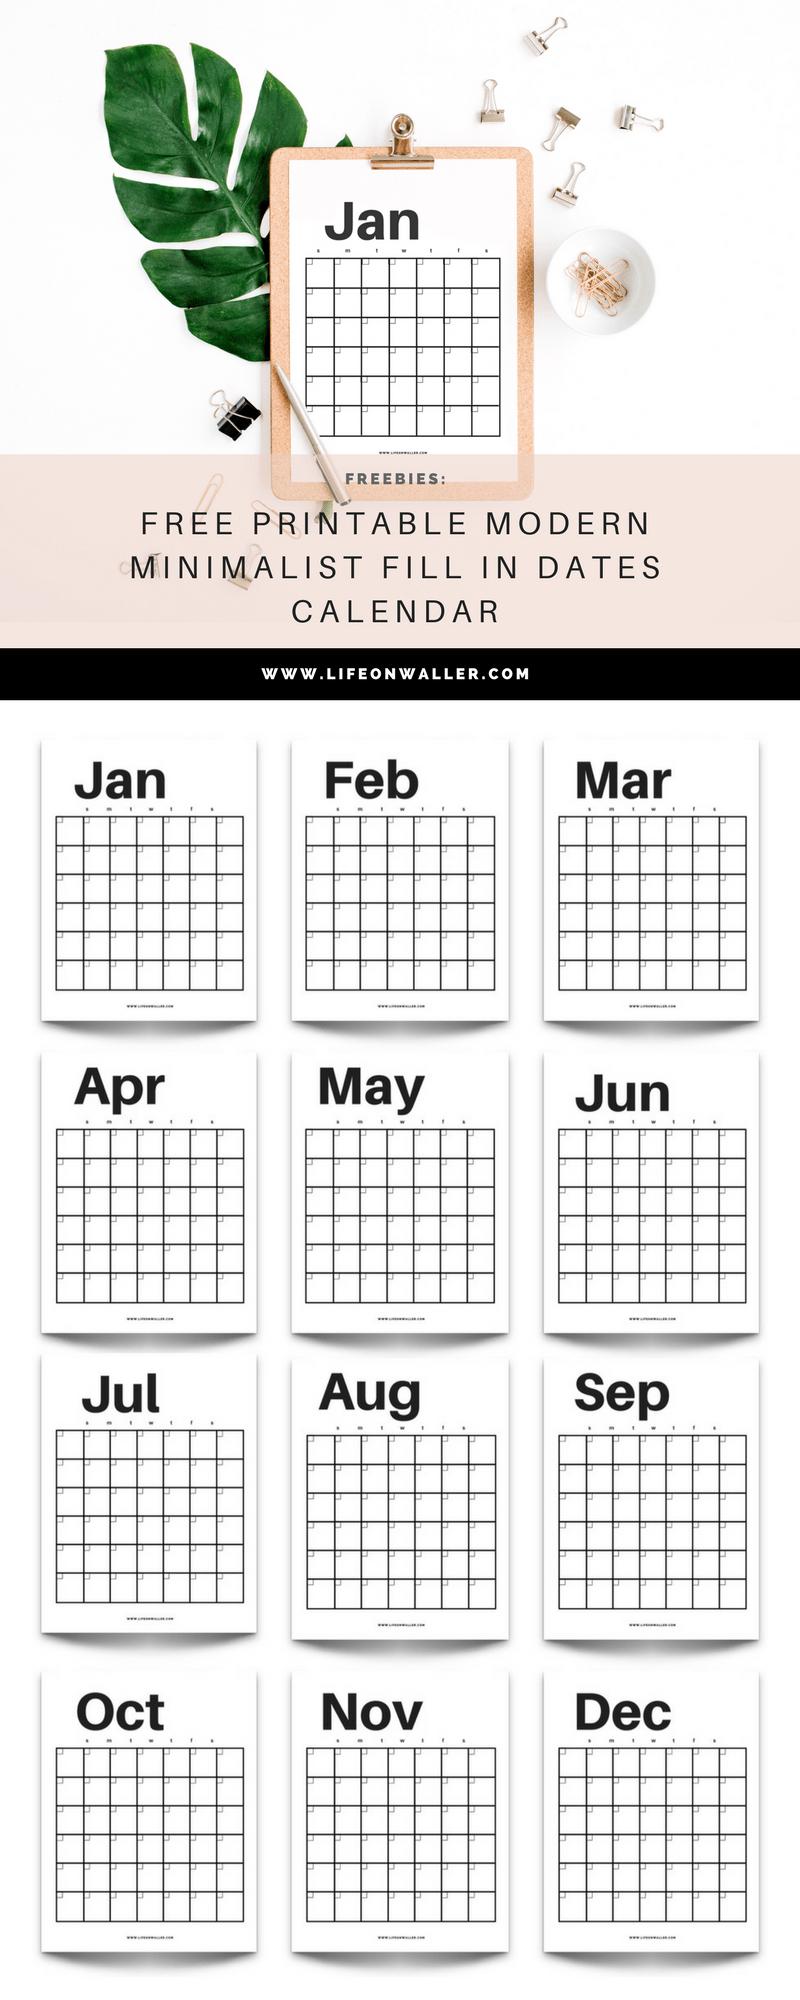 Free Printable Modern Minimalist Fill In Calendar – Use For Free Fill In Calendar